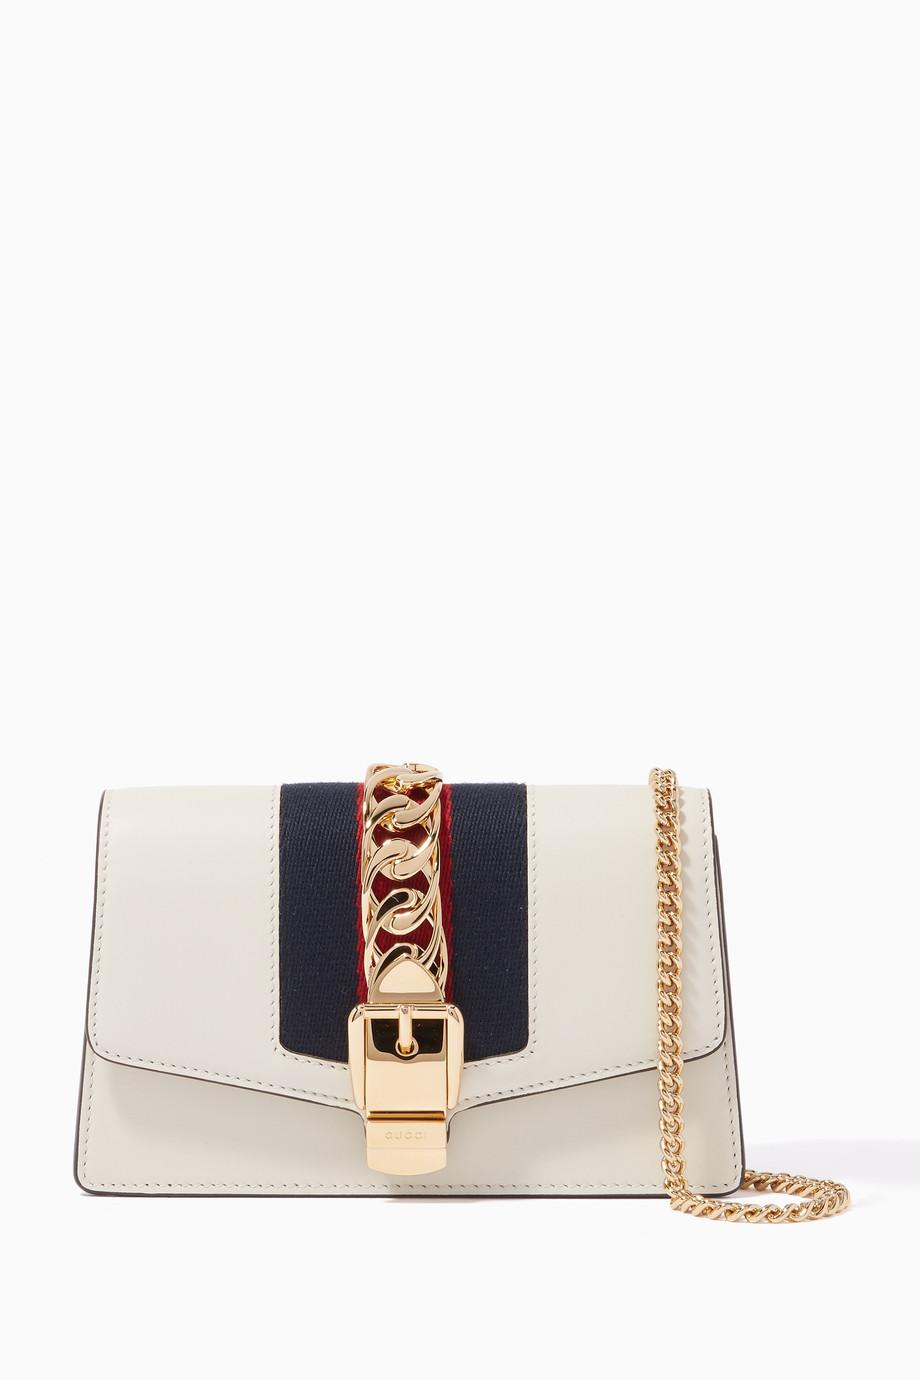 324e24519c9a6c Shop Gucci Neutral Ivory Sylvie Leather Chain Wallet Bag for Women ...